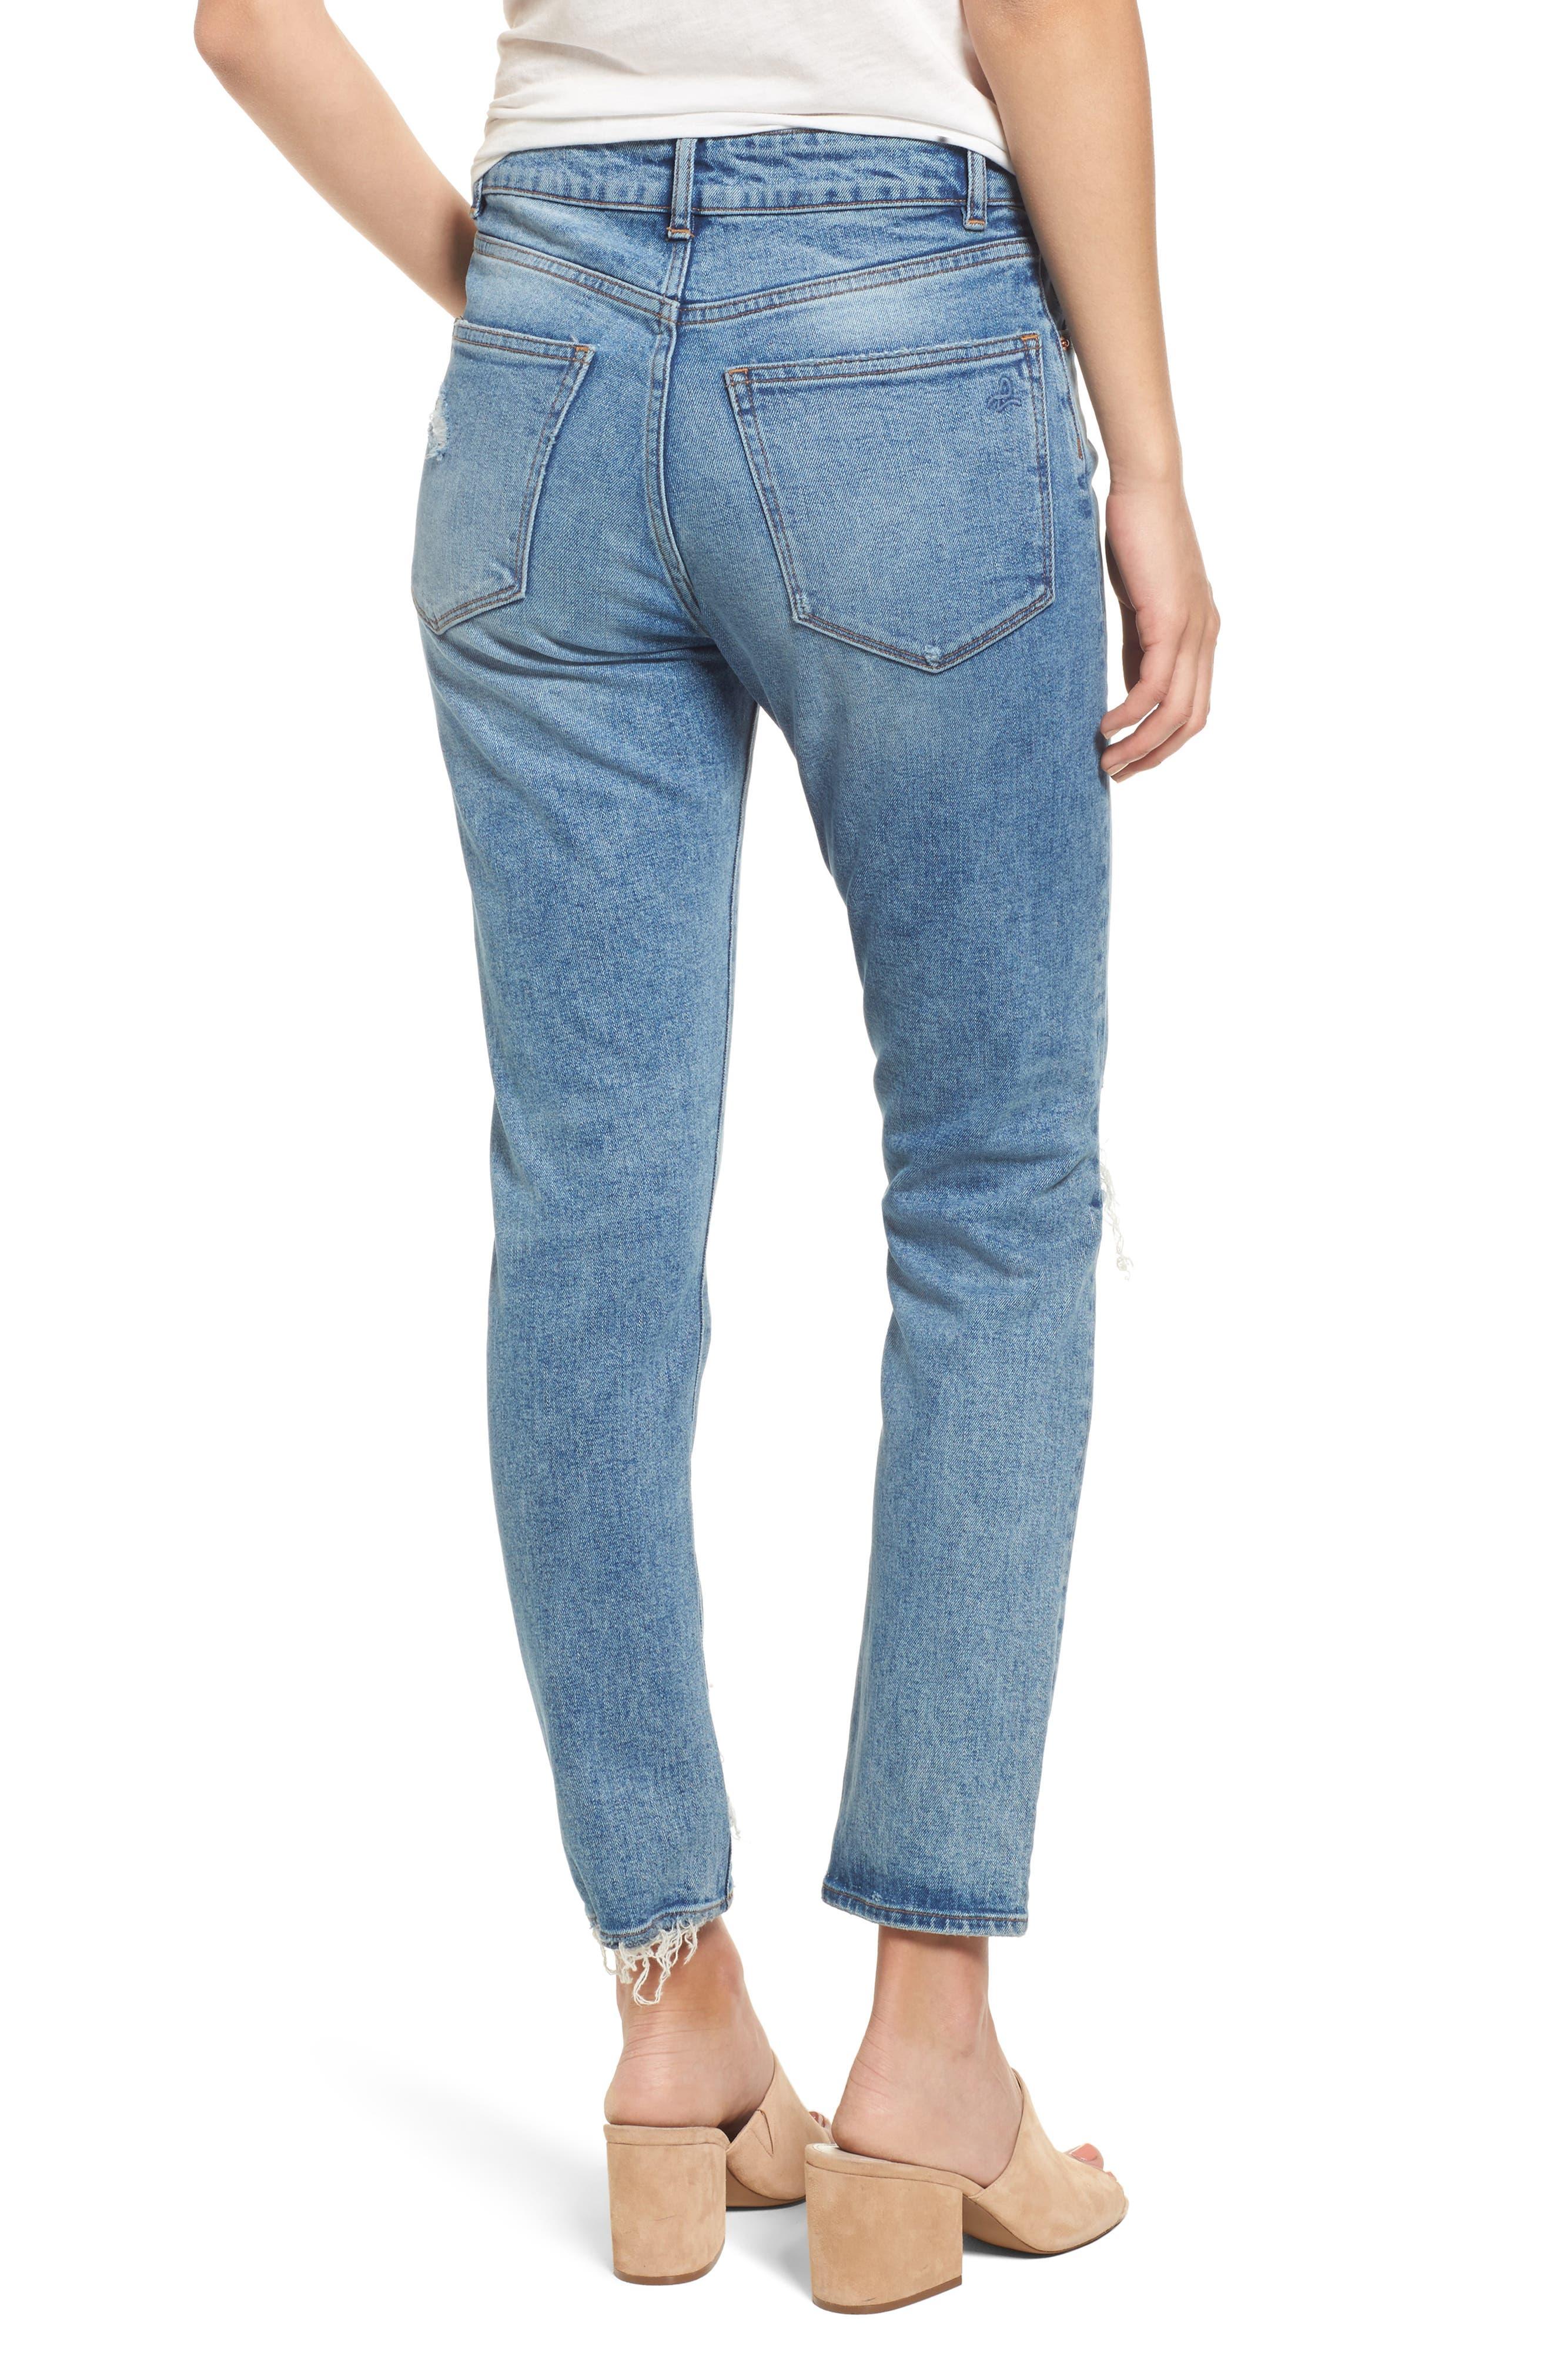 Bella Vintage Ankle Skinny Jeans,                             Alternate thumbnail 2, color,                             430